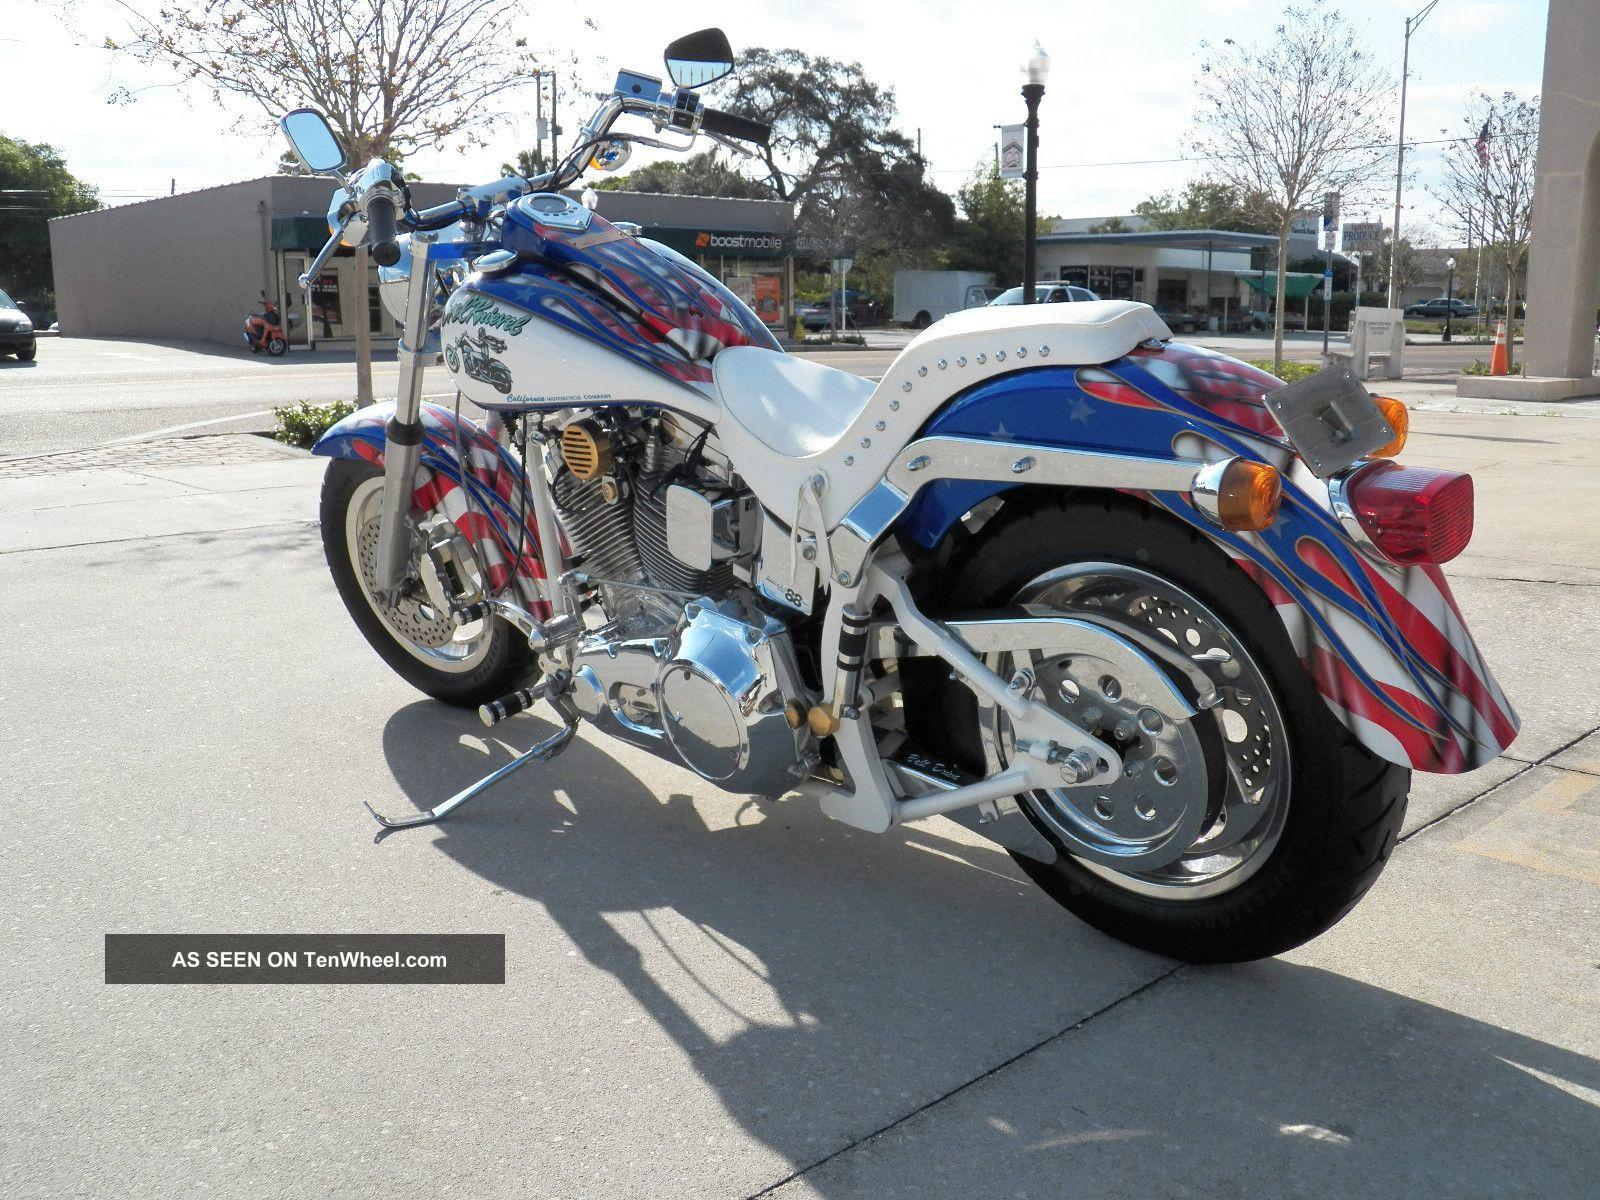 Evel Knievel Harley Davidson Chopper Photograph By Frank: 1998 California Motorcycle Company (evel Knievel